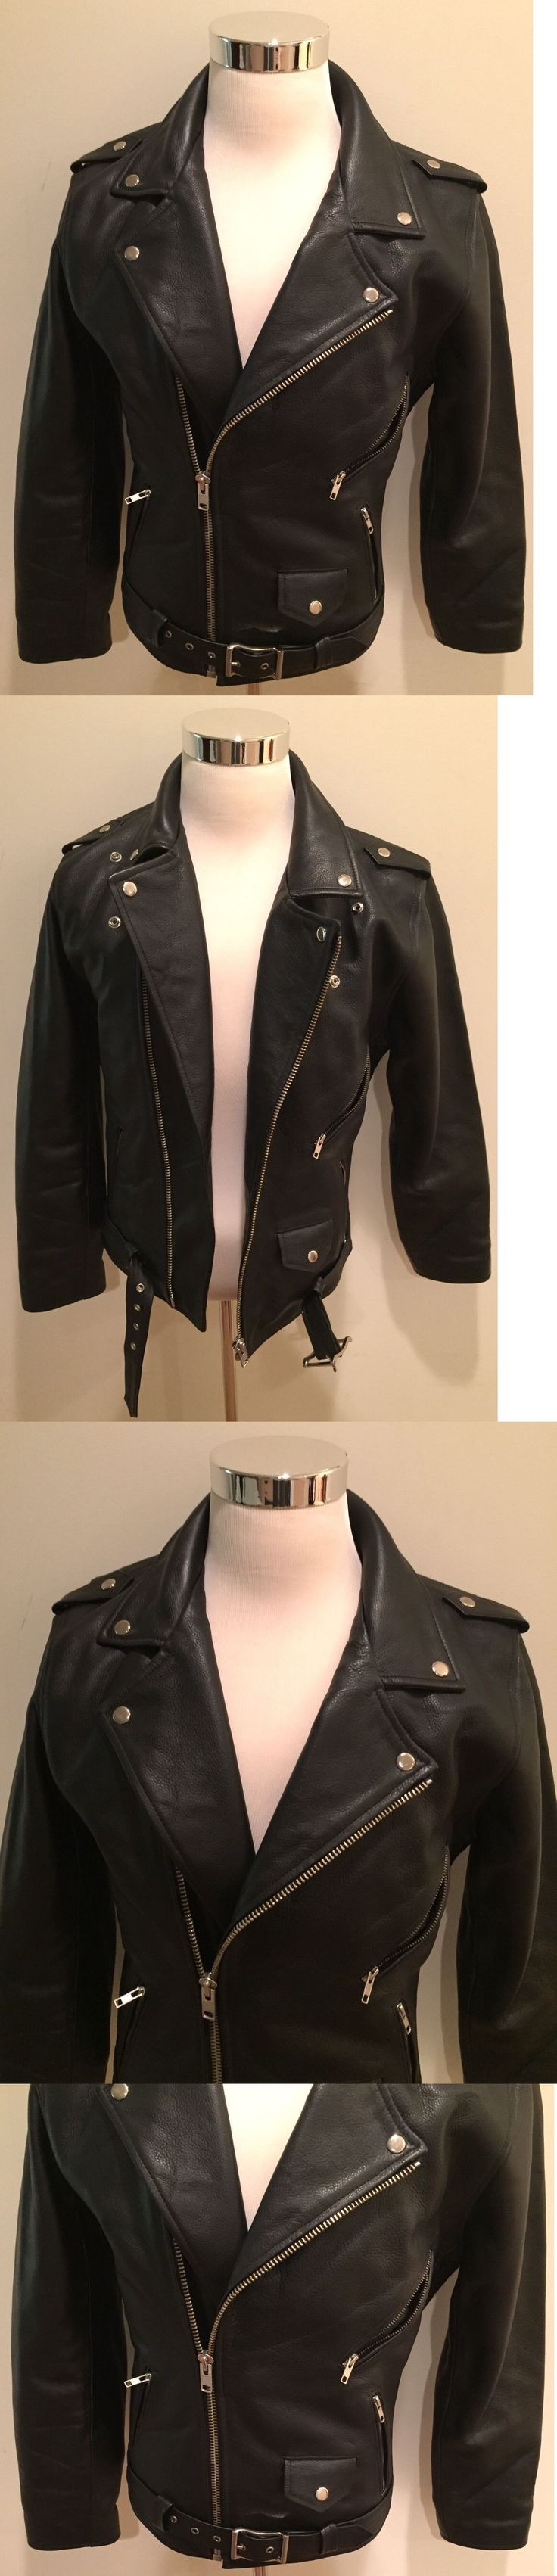 Men Coats And Jackets: Rare New Black Motorcycle Biker Bomber Leather Jacket Men S Sz Medium M -> BUY IT NOW ONLY: $224.99 on eBay!